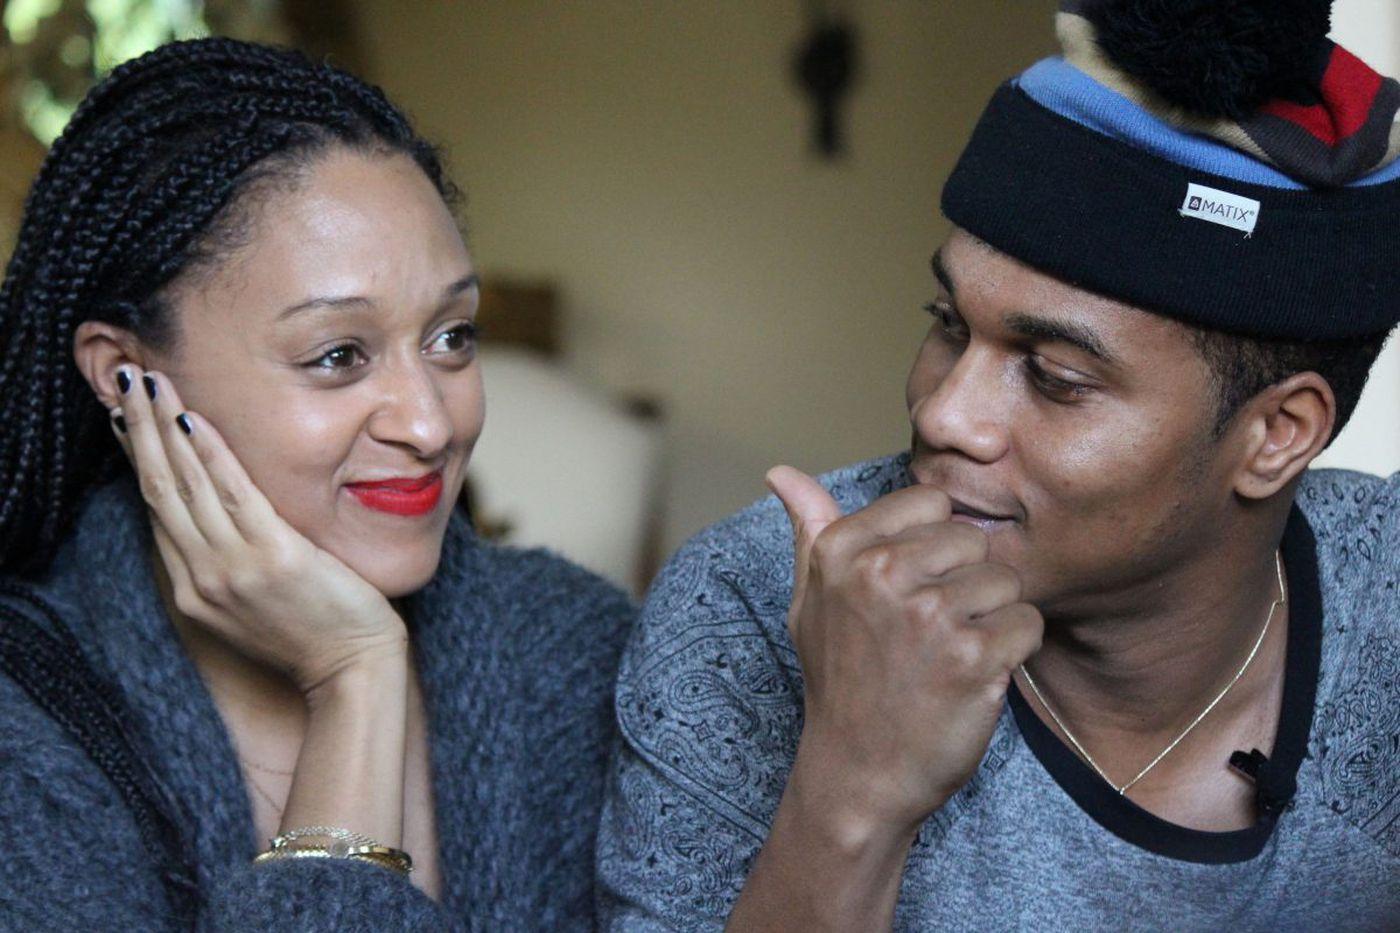 Philly filmmaker explores 'Black Love' on both sides of camera